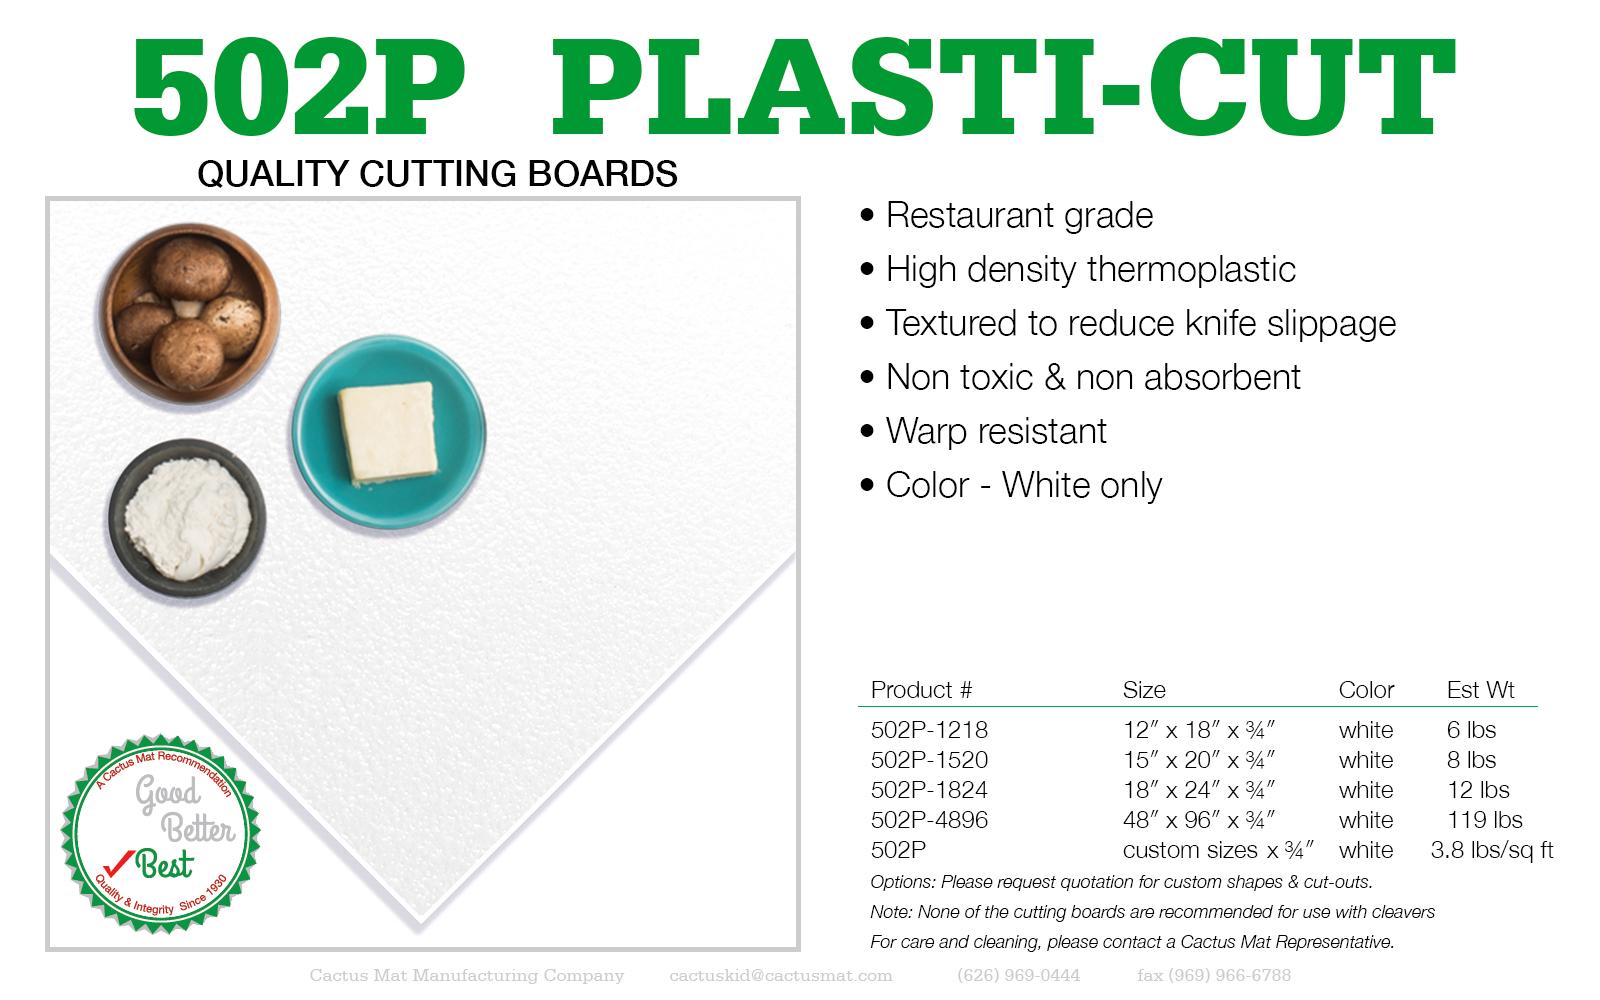 501P_Plasti-Cut_1600x1000.jpg